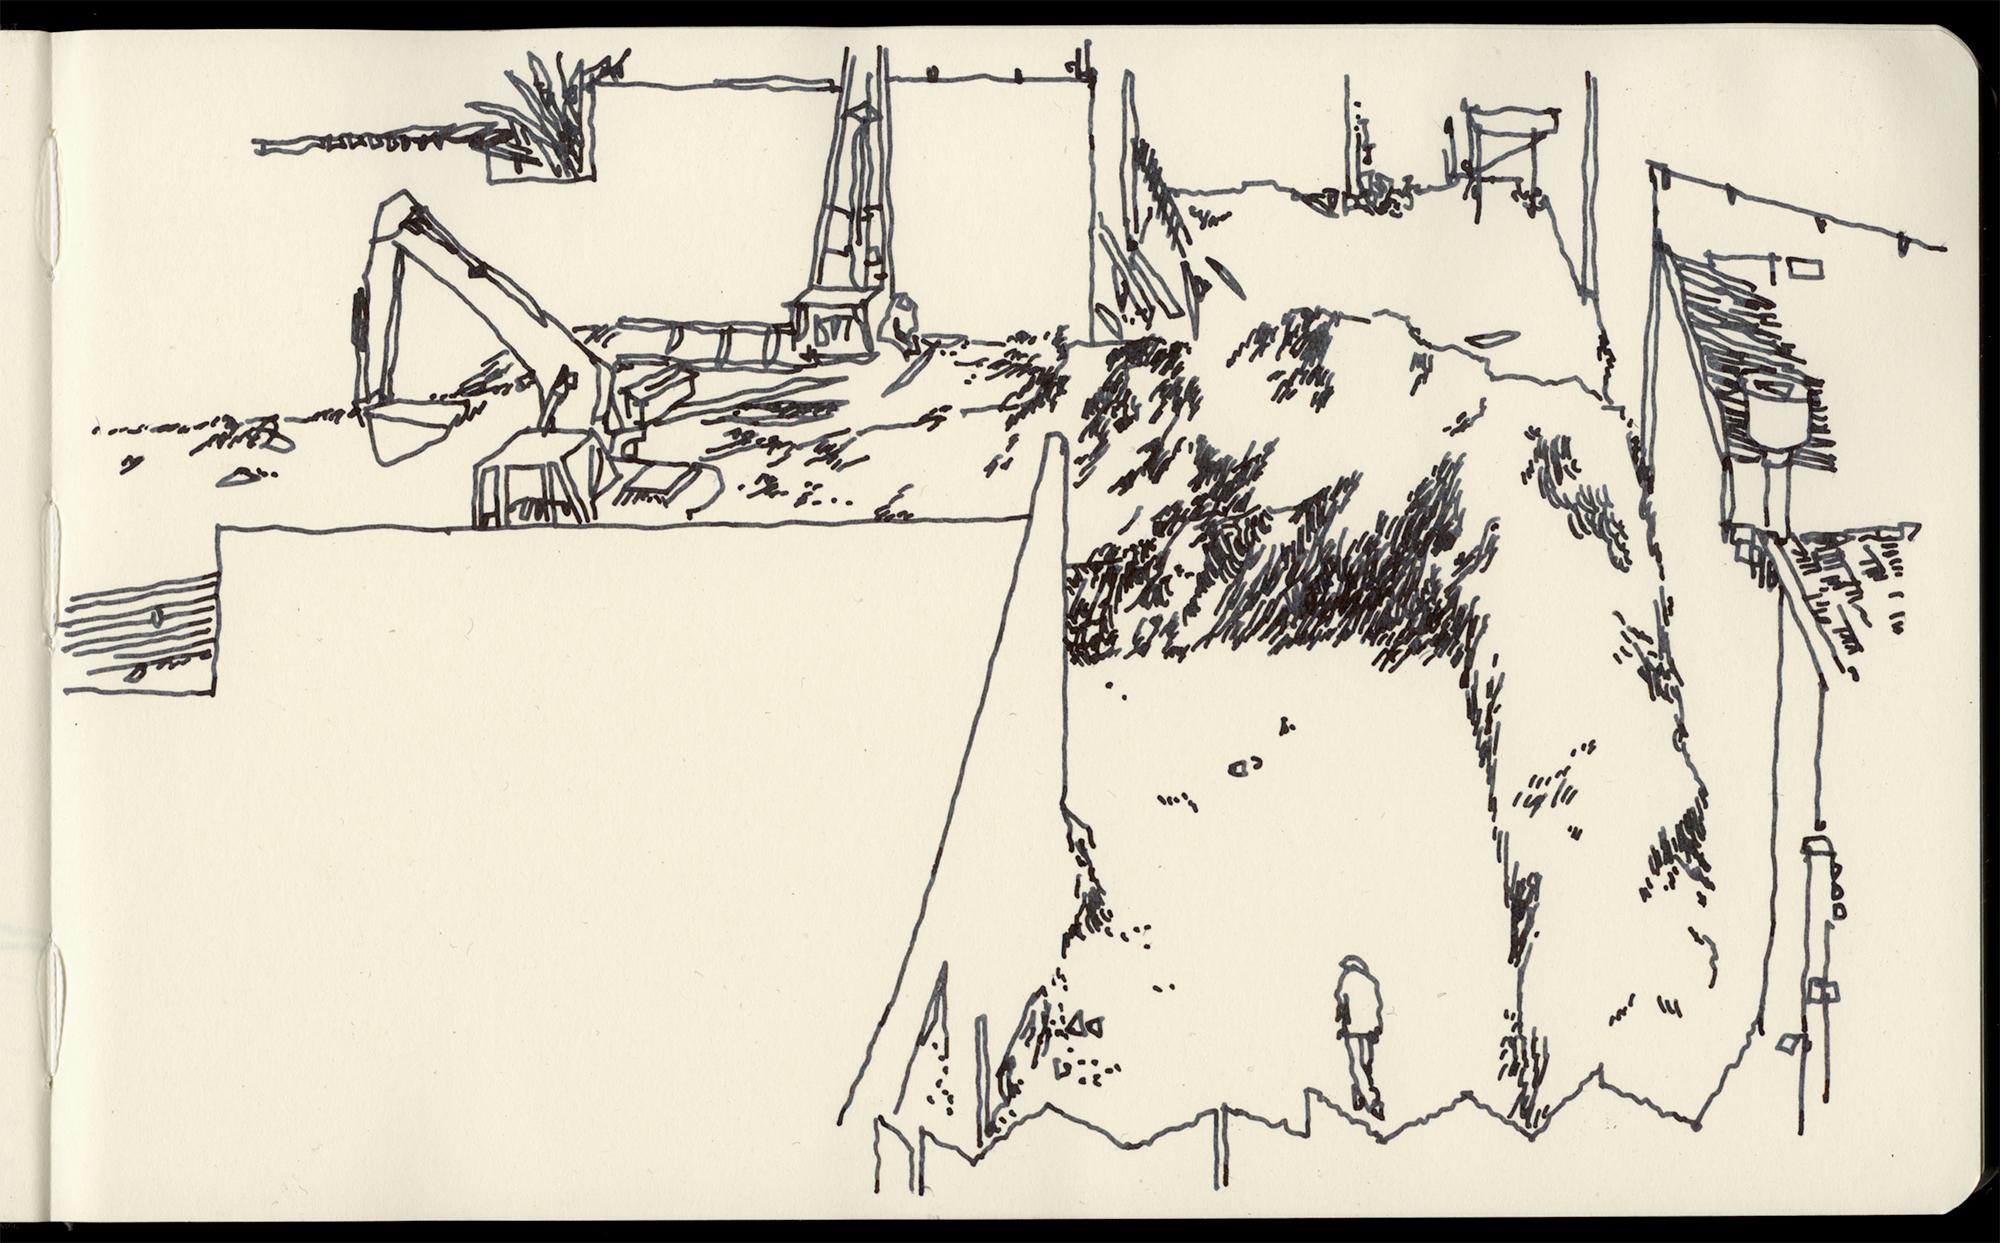 Demolição-Wisard-02-daniloz